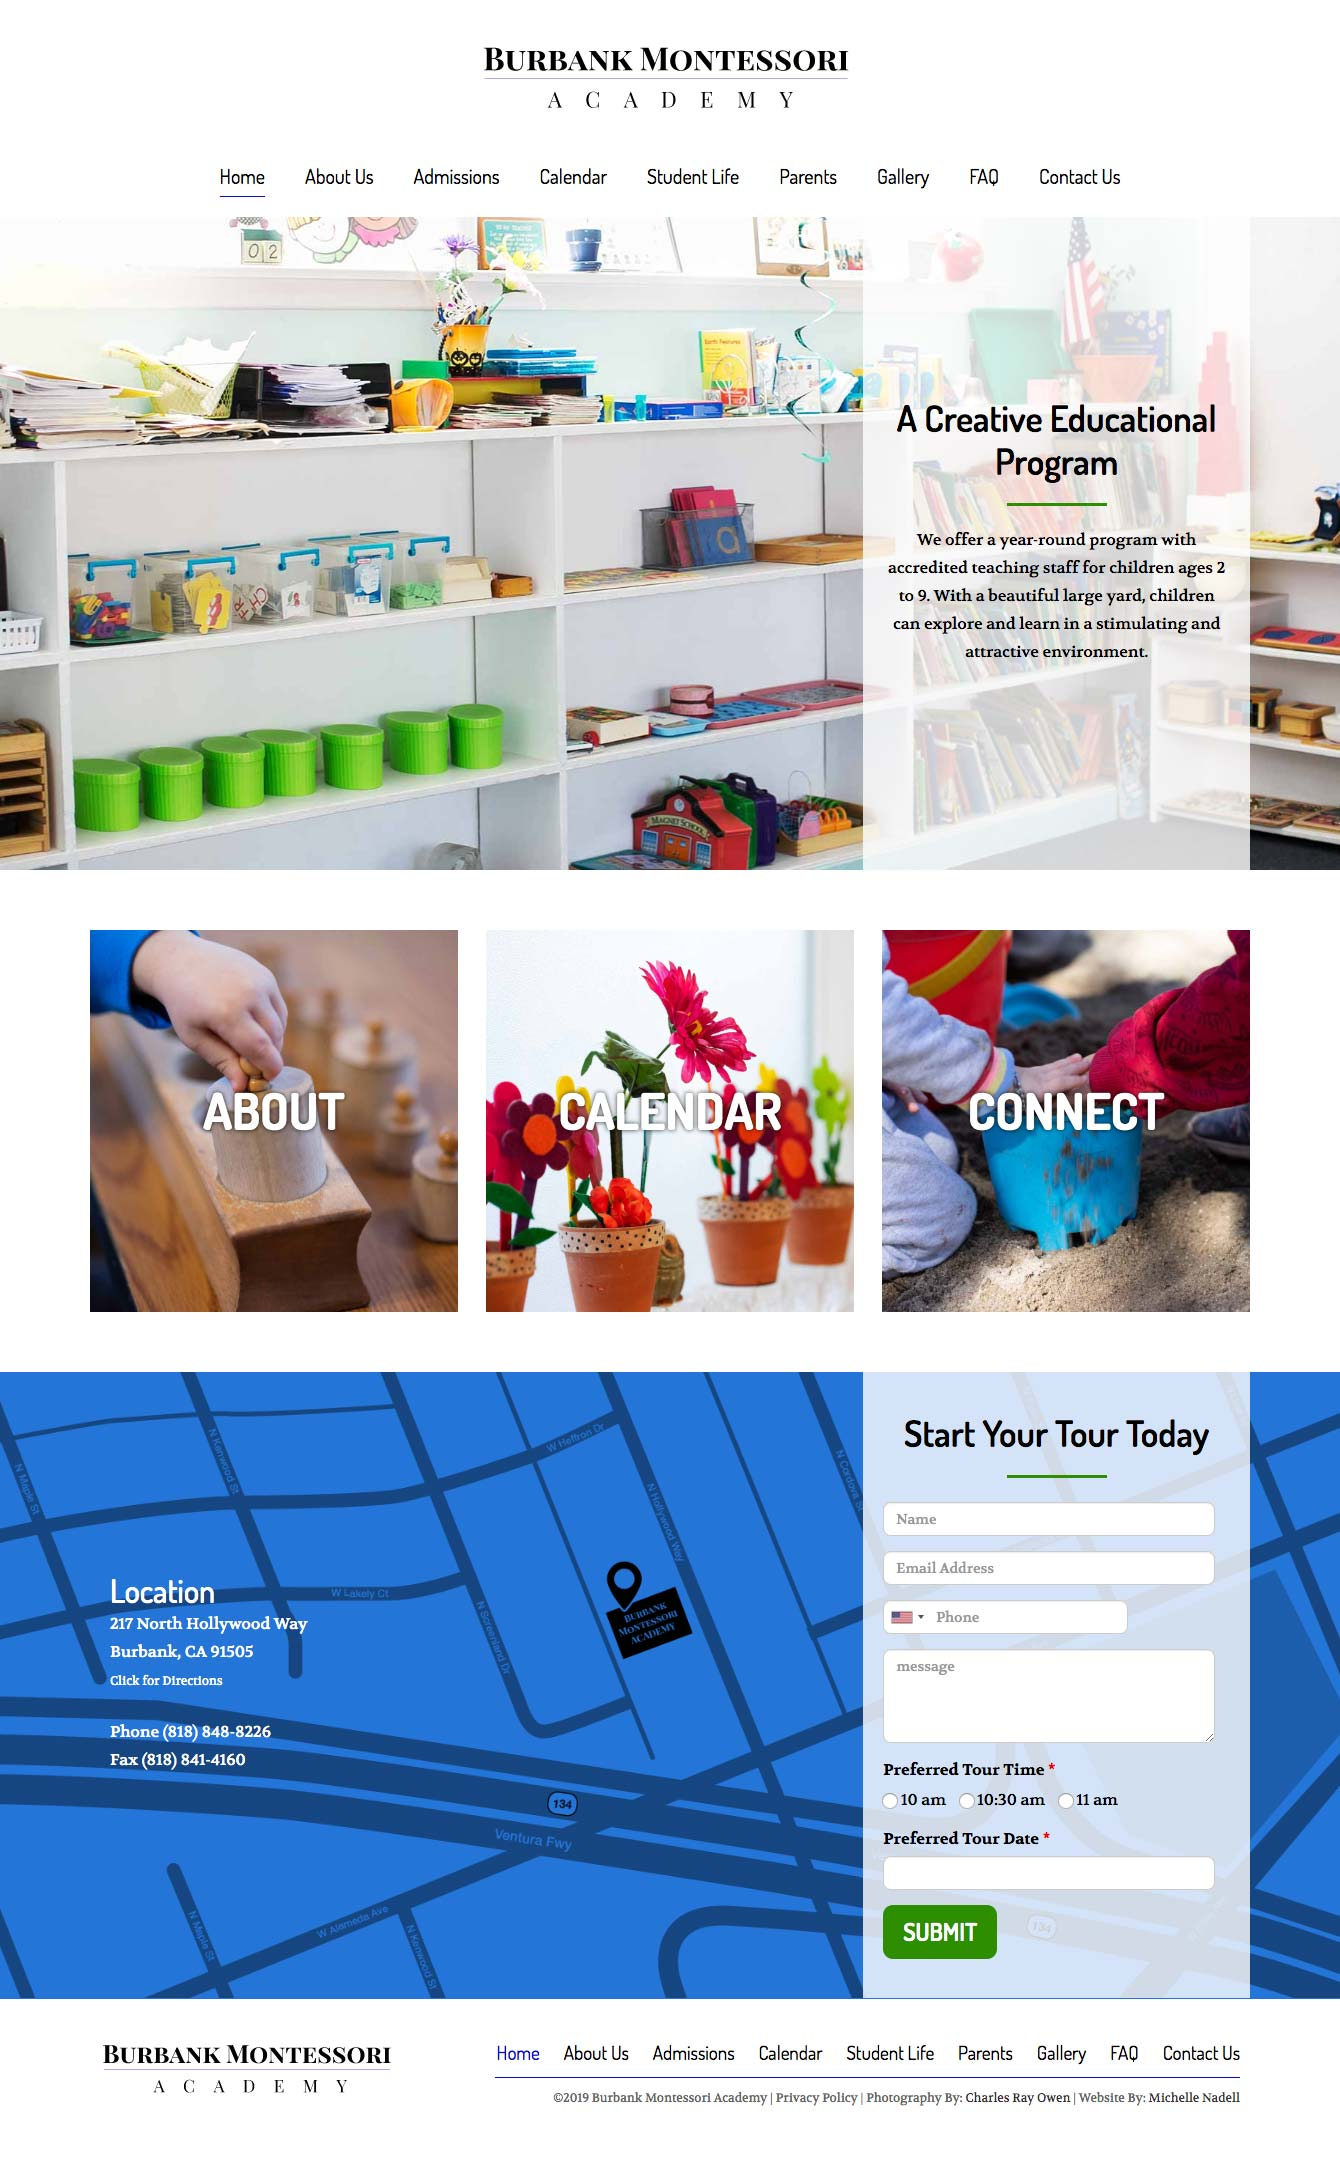 Burbank Montessori Academy home page screen shot